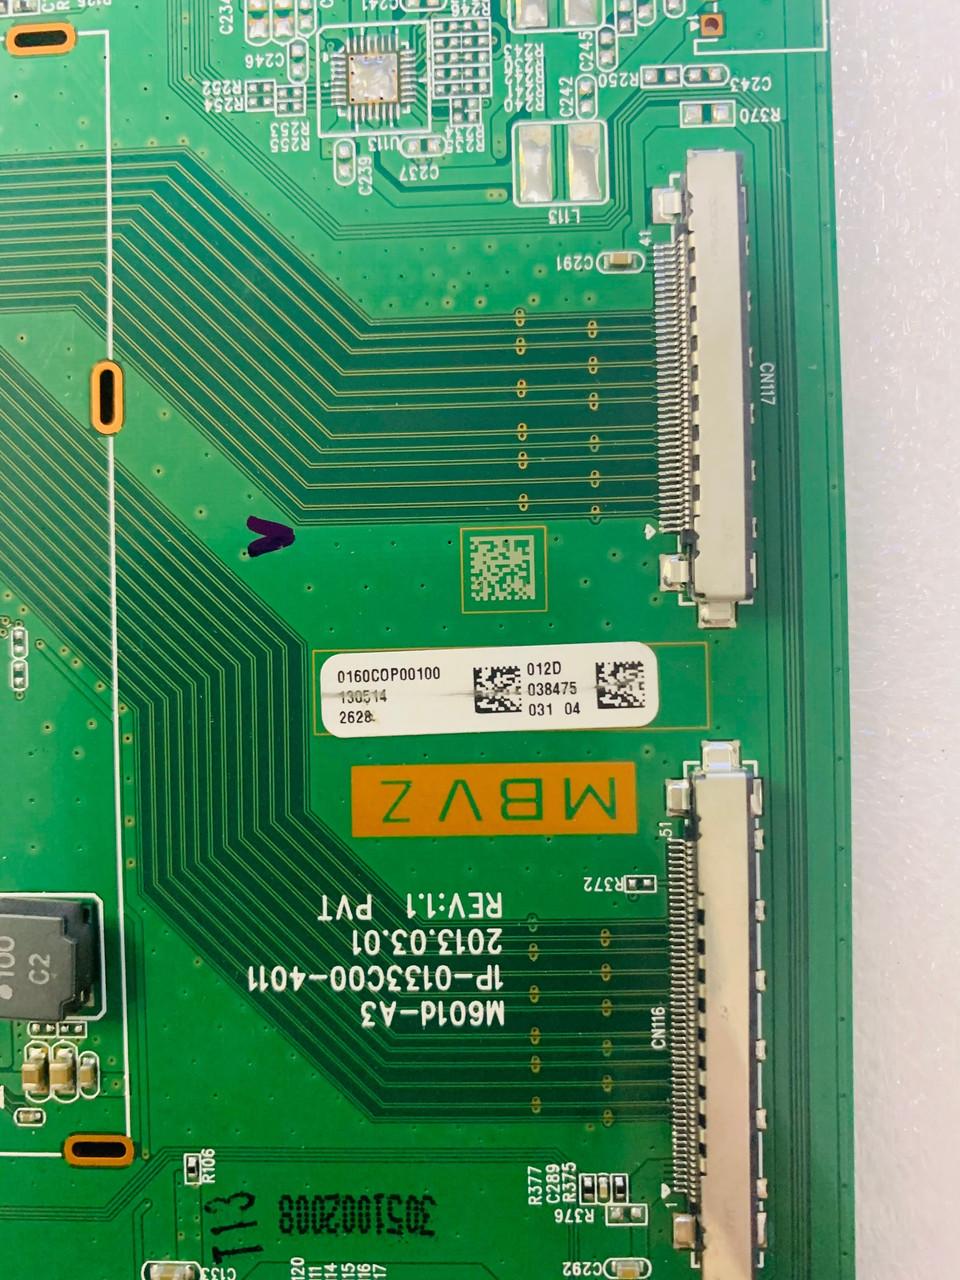 Vizio Y8386012S Main Board for M601d-A3R / M601D-A3 ( LFTROWAP,LFTROWCQ , LFTROWBP, LFTROWDQ )